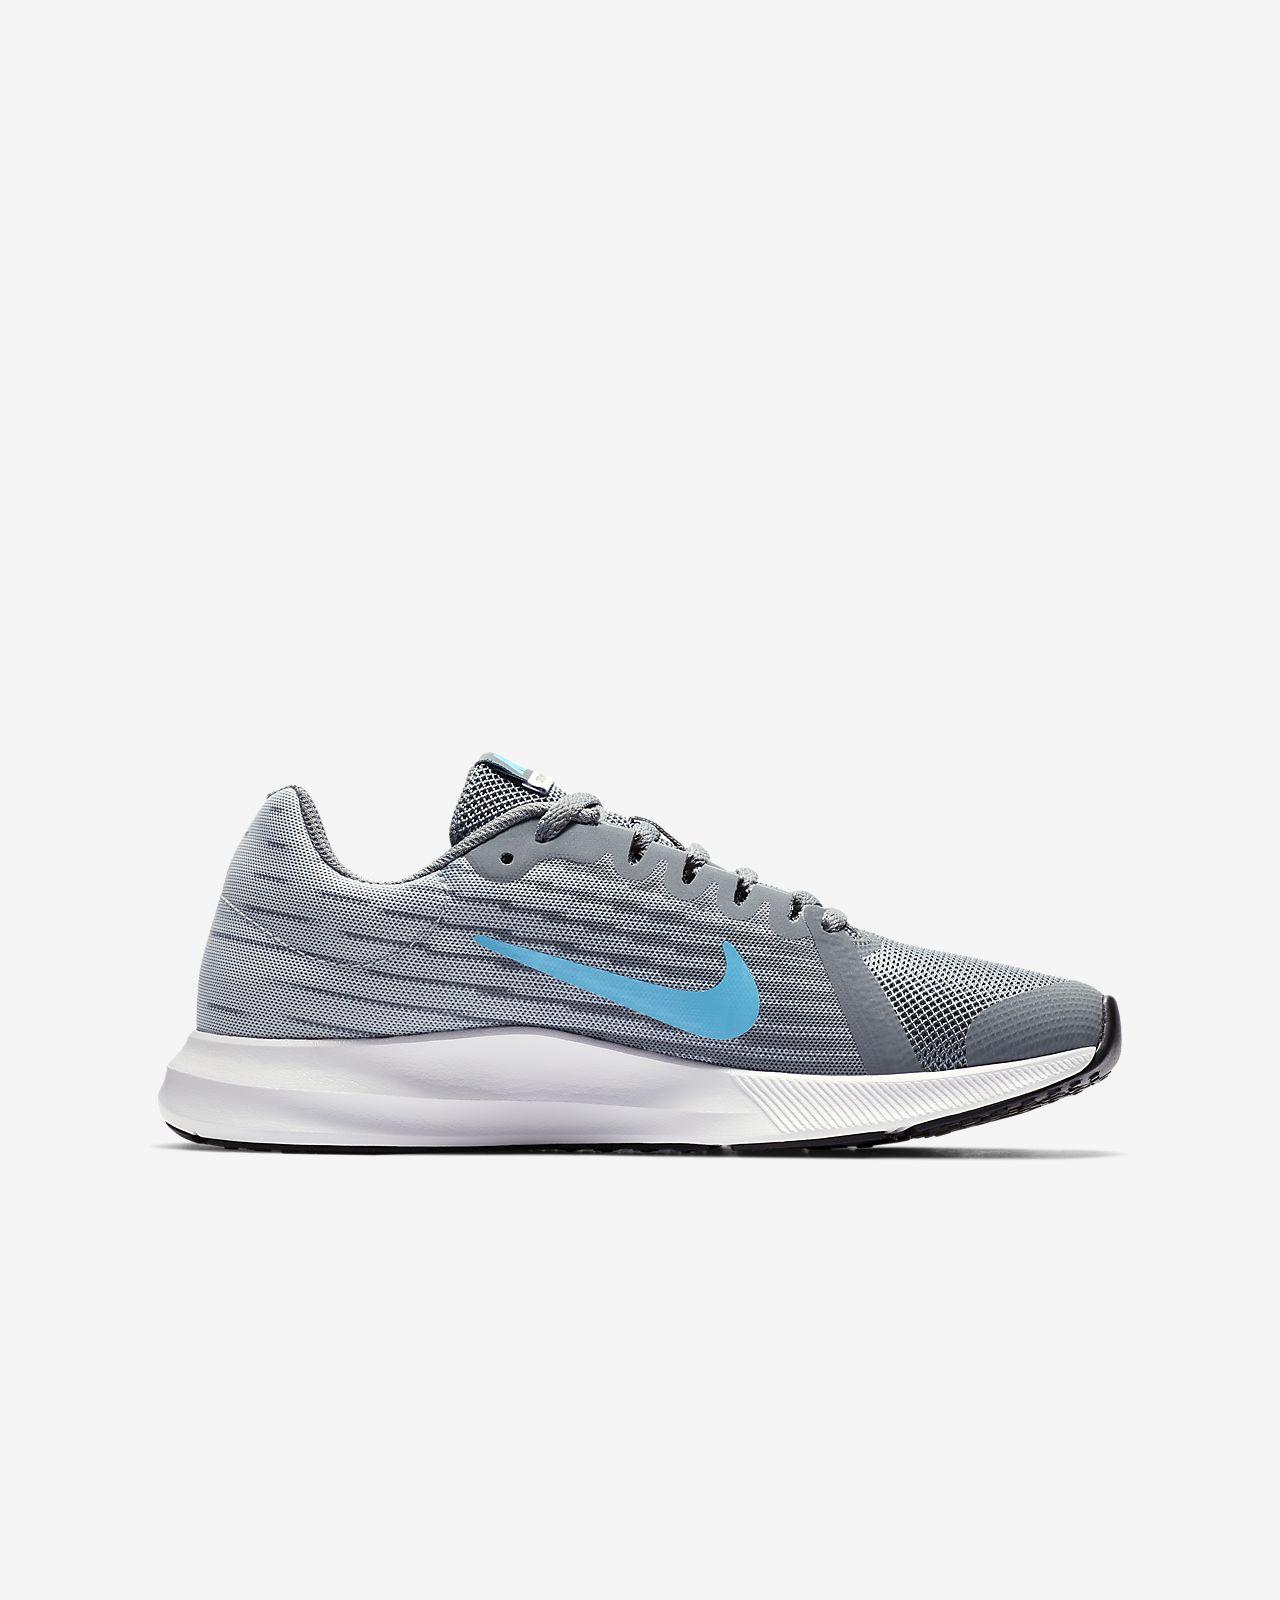 6daa21adf5 Nike Downshifter 8 Older Kids' (Boys') Running Shoe. Nike.com AU